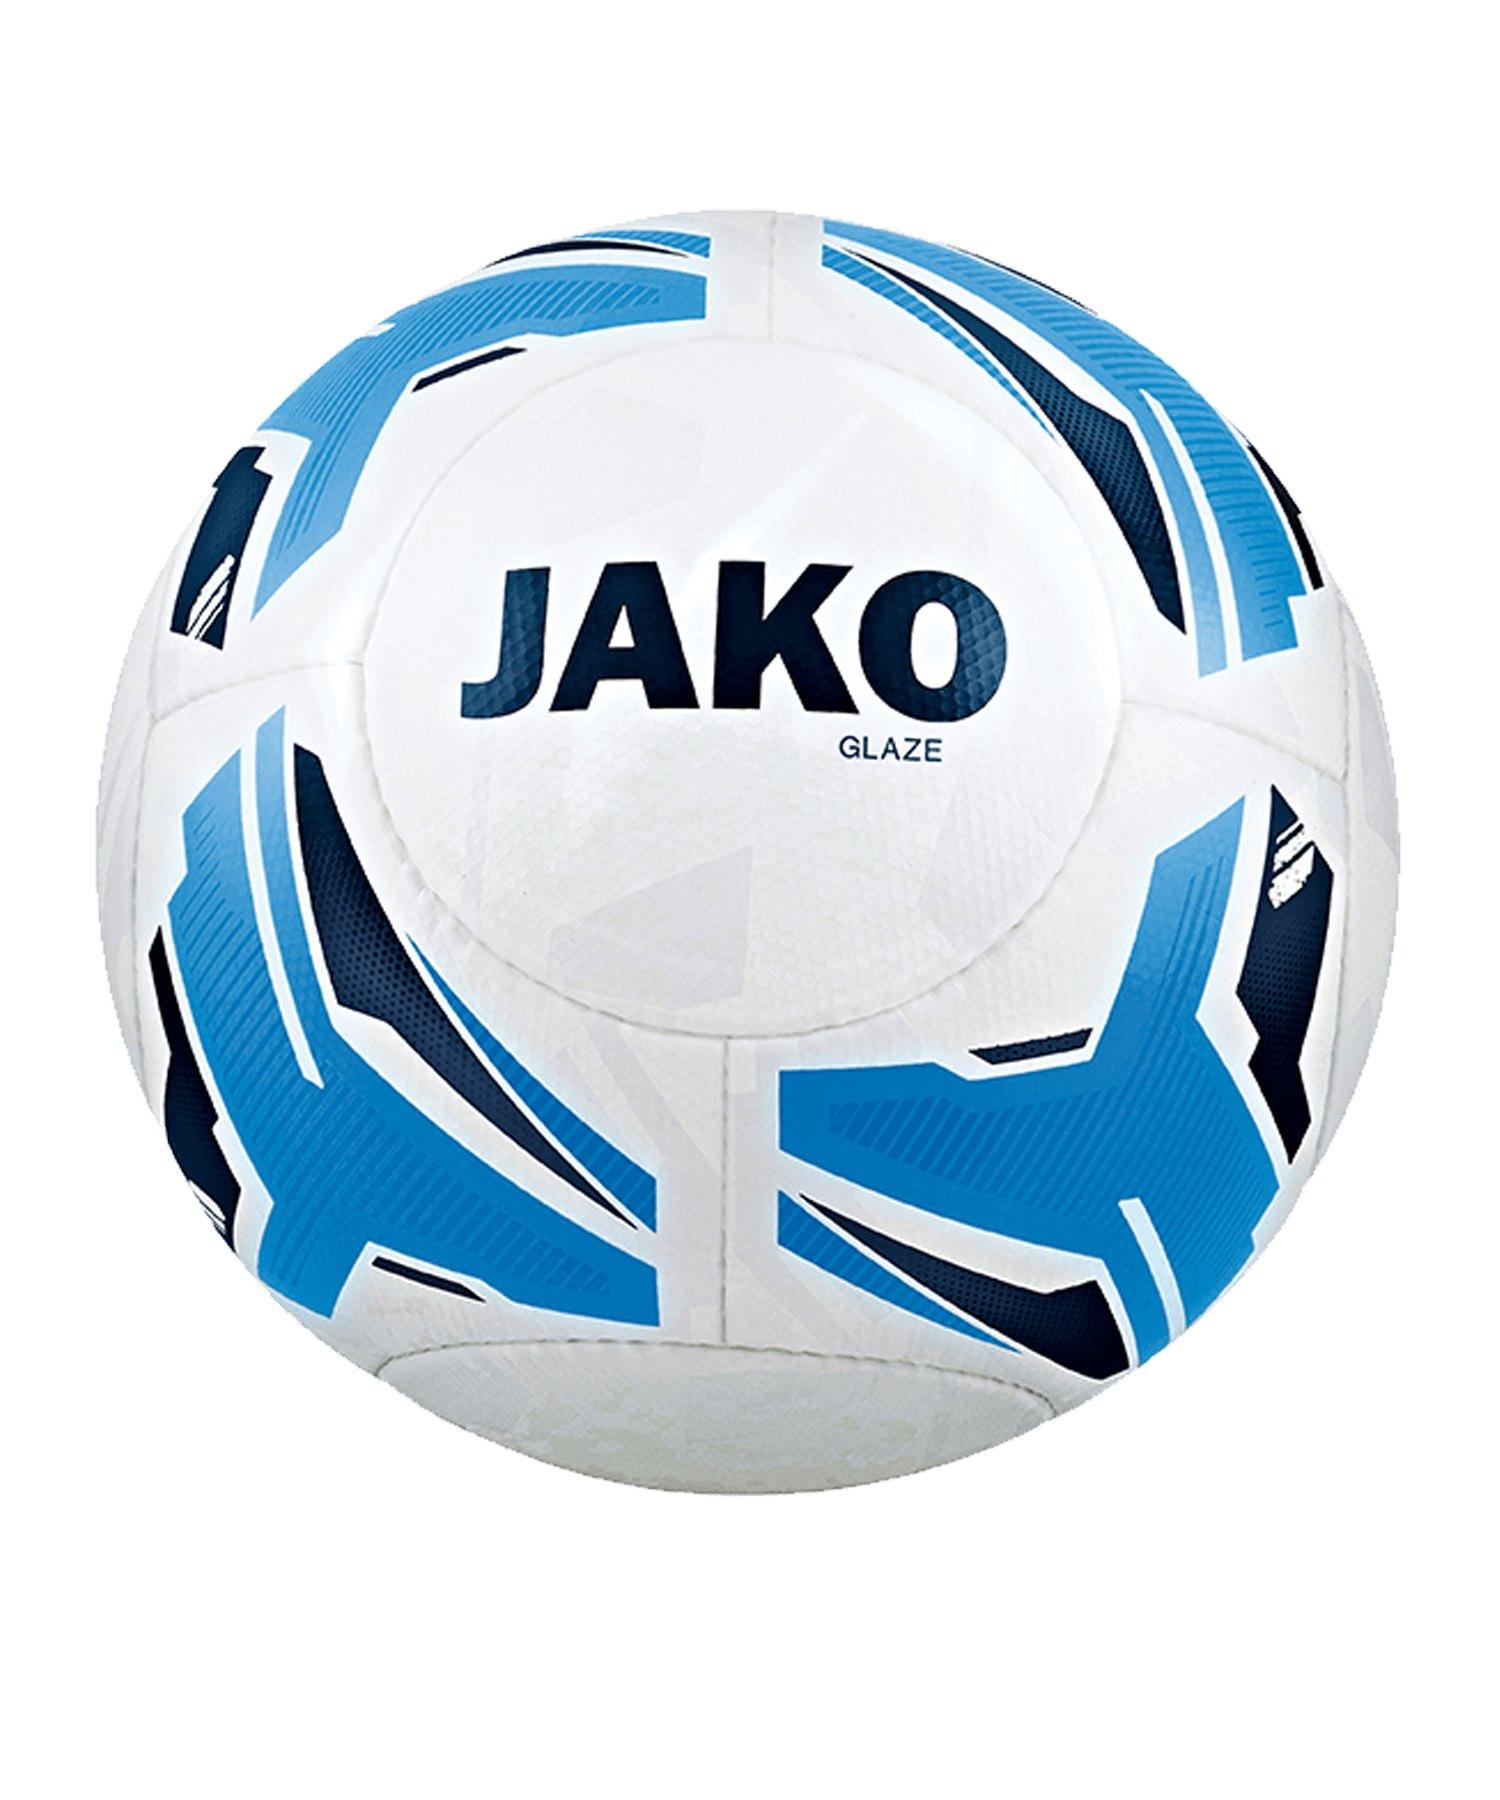 JAKO Glaze Trainingsball Weiss F45 - weiss